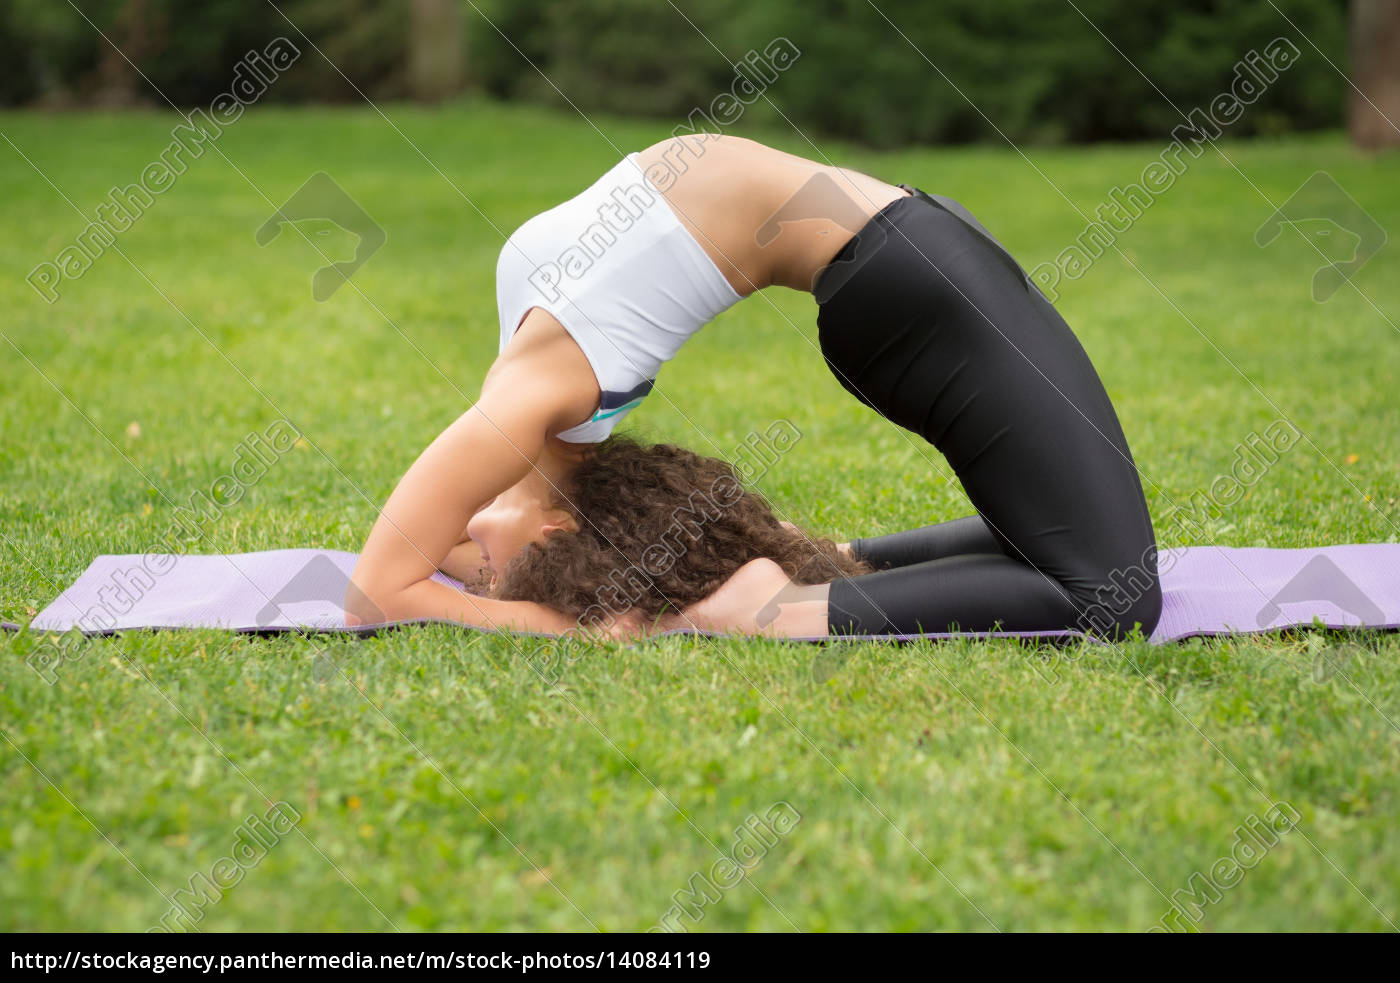 pretty, woman, doing, yoga, exercises - 14084119